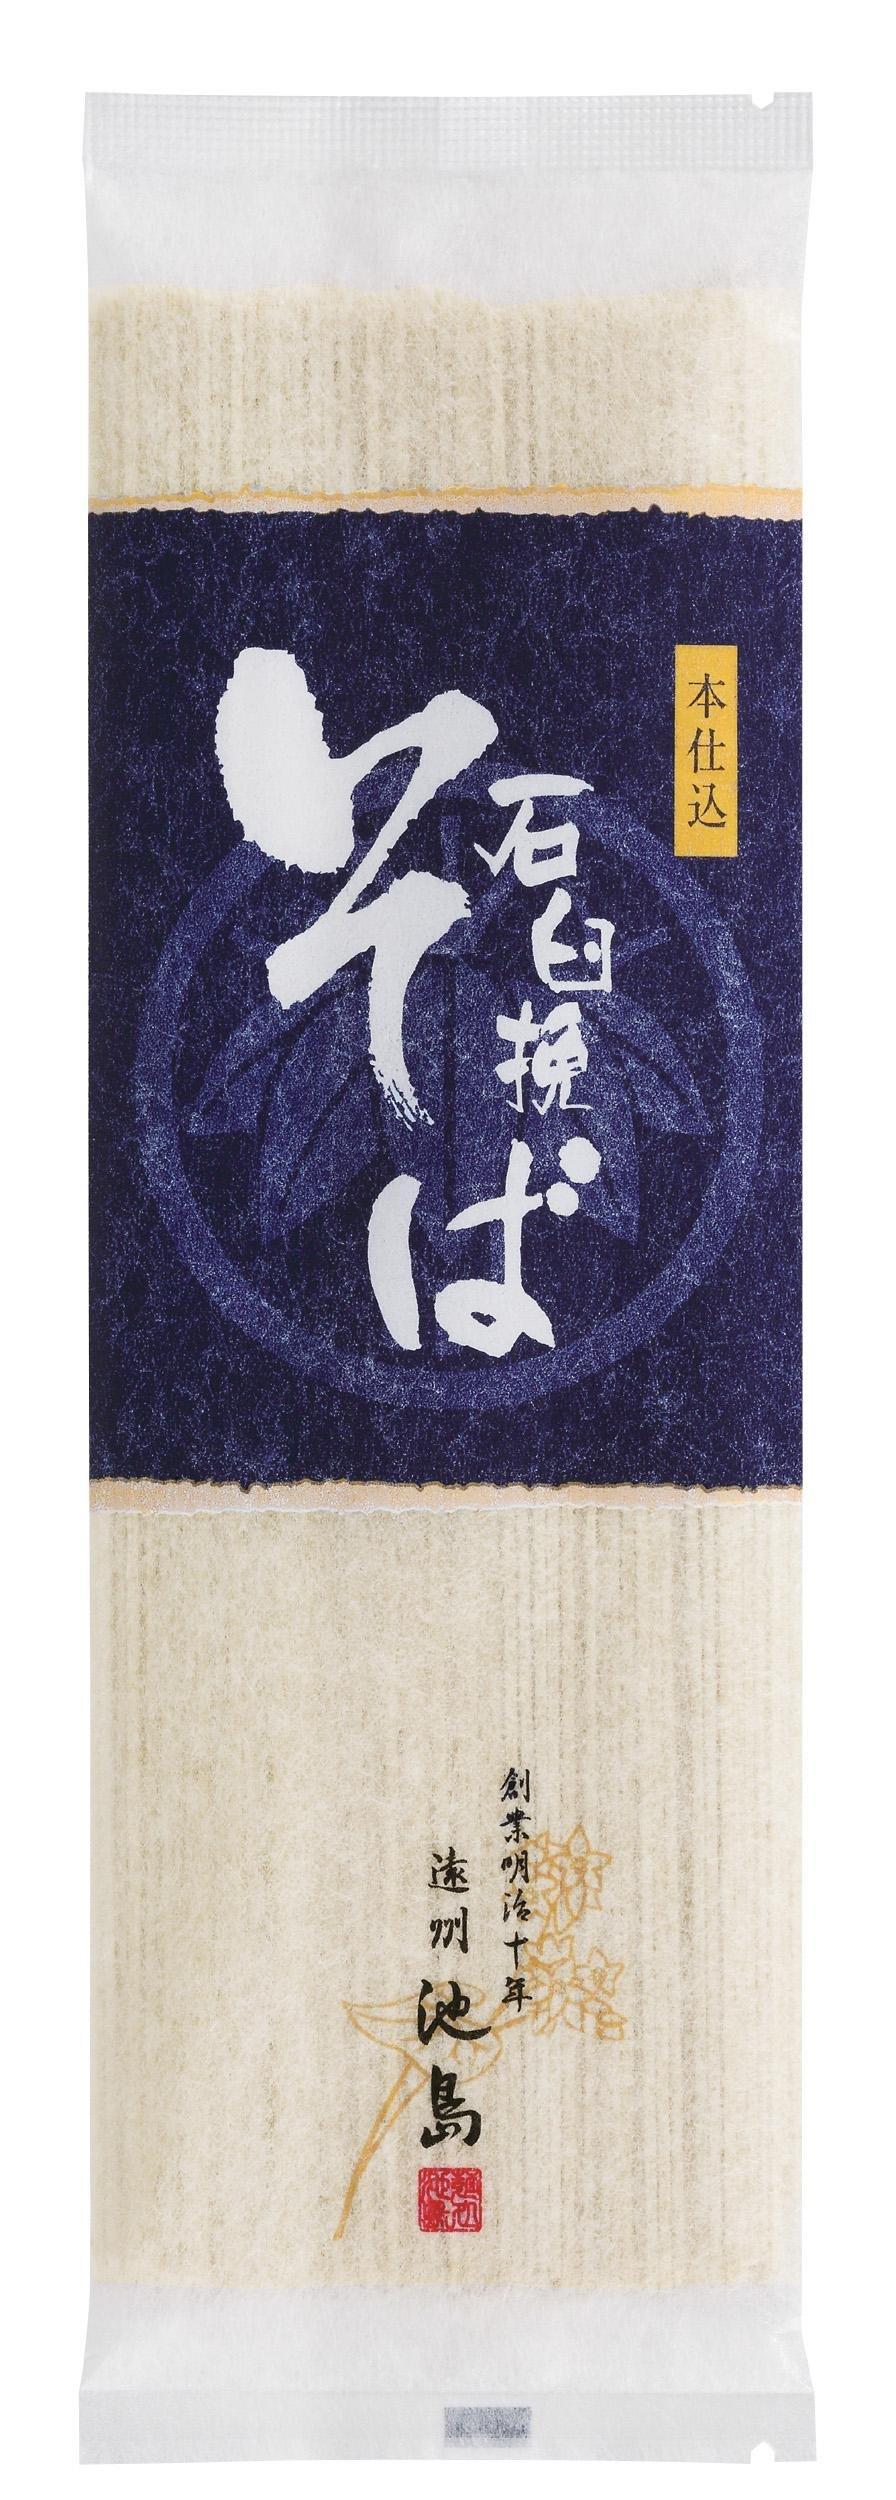 180gX10 or buckwheat Ikeshima stone ground